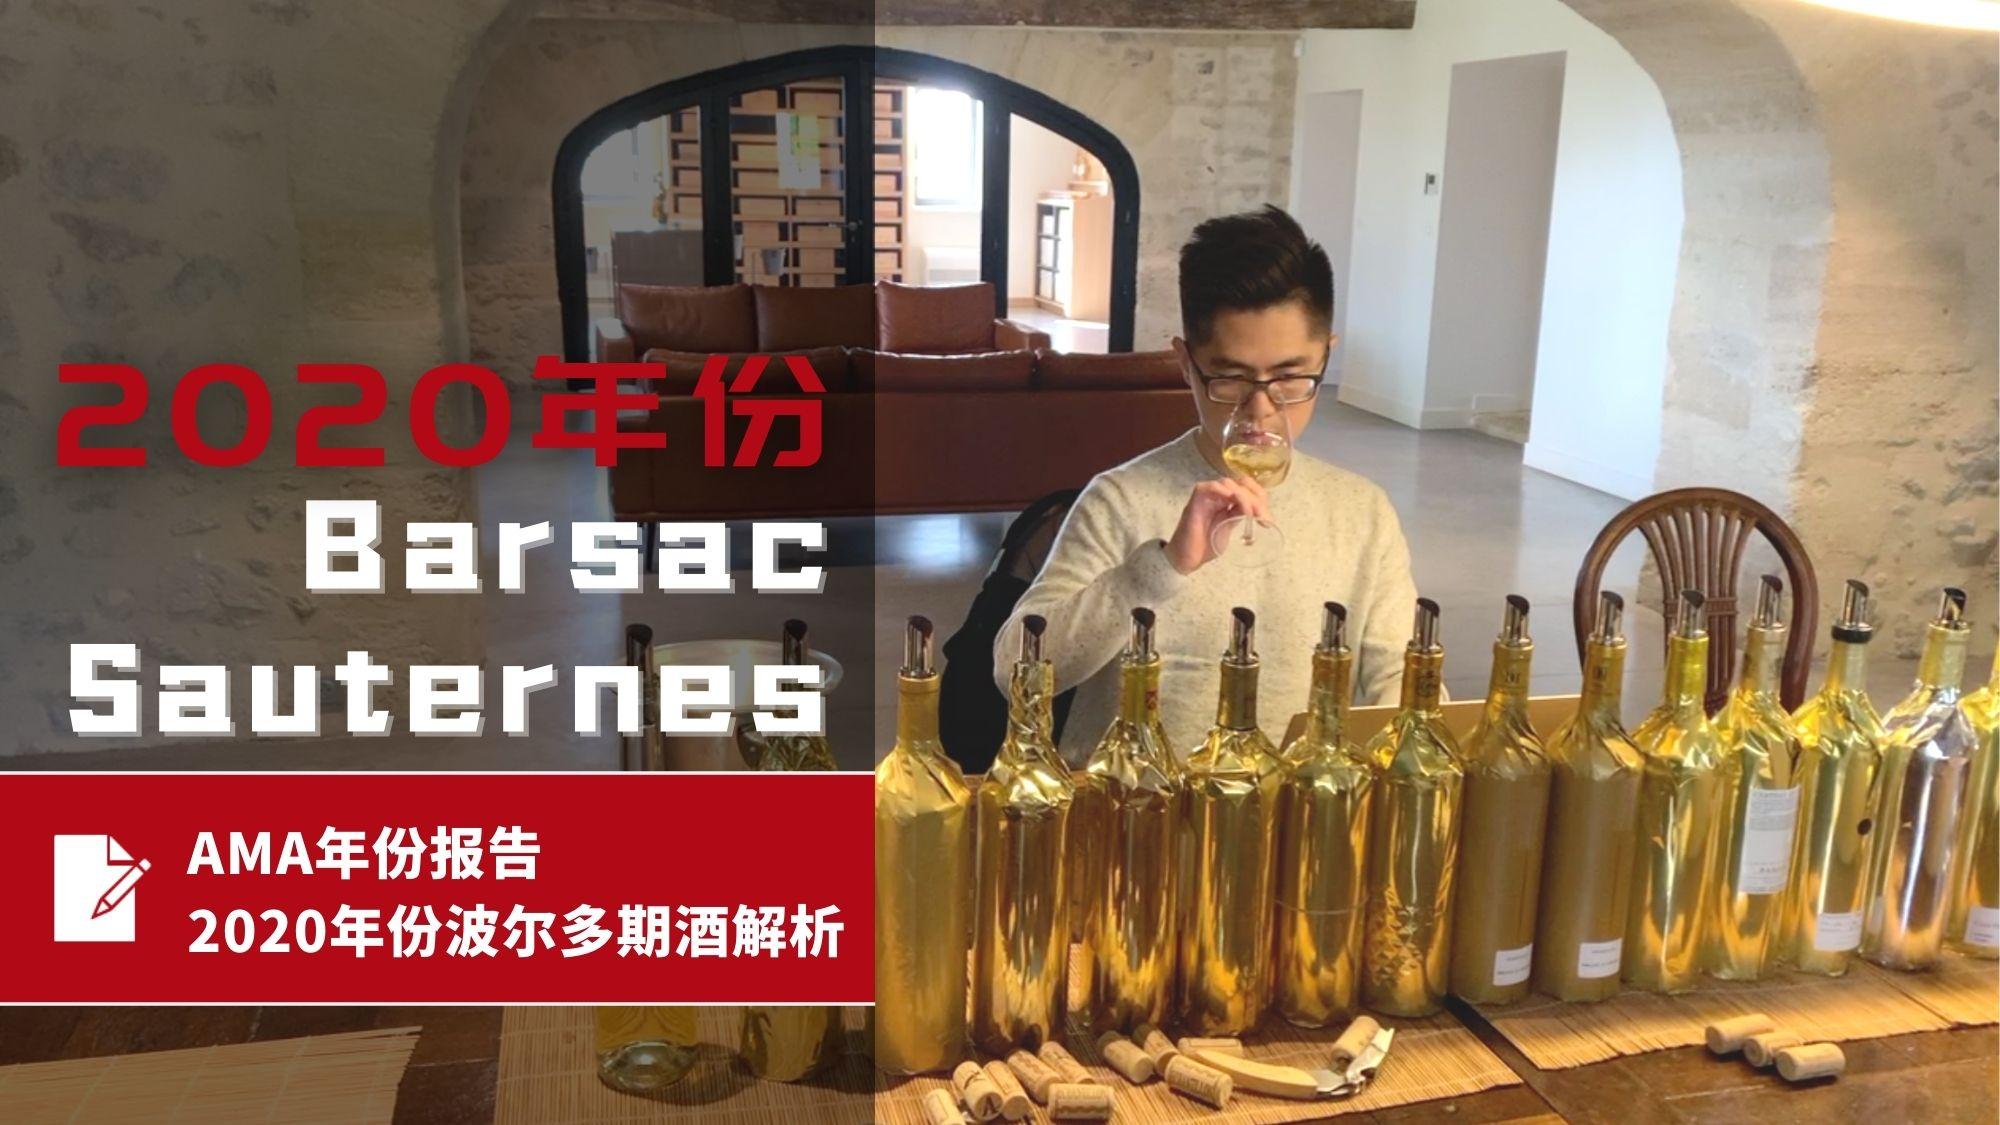 AMA年份报告 – 2020年份波尔多波期酒解析 – Sauternes & Barsac 苏玳、巴萨克 - Alexandre Ma